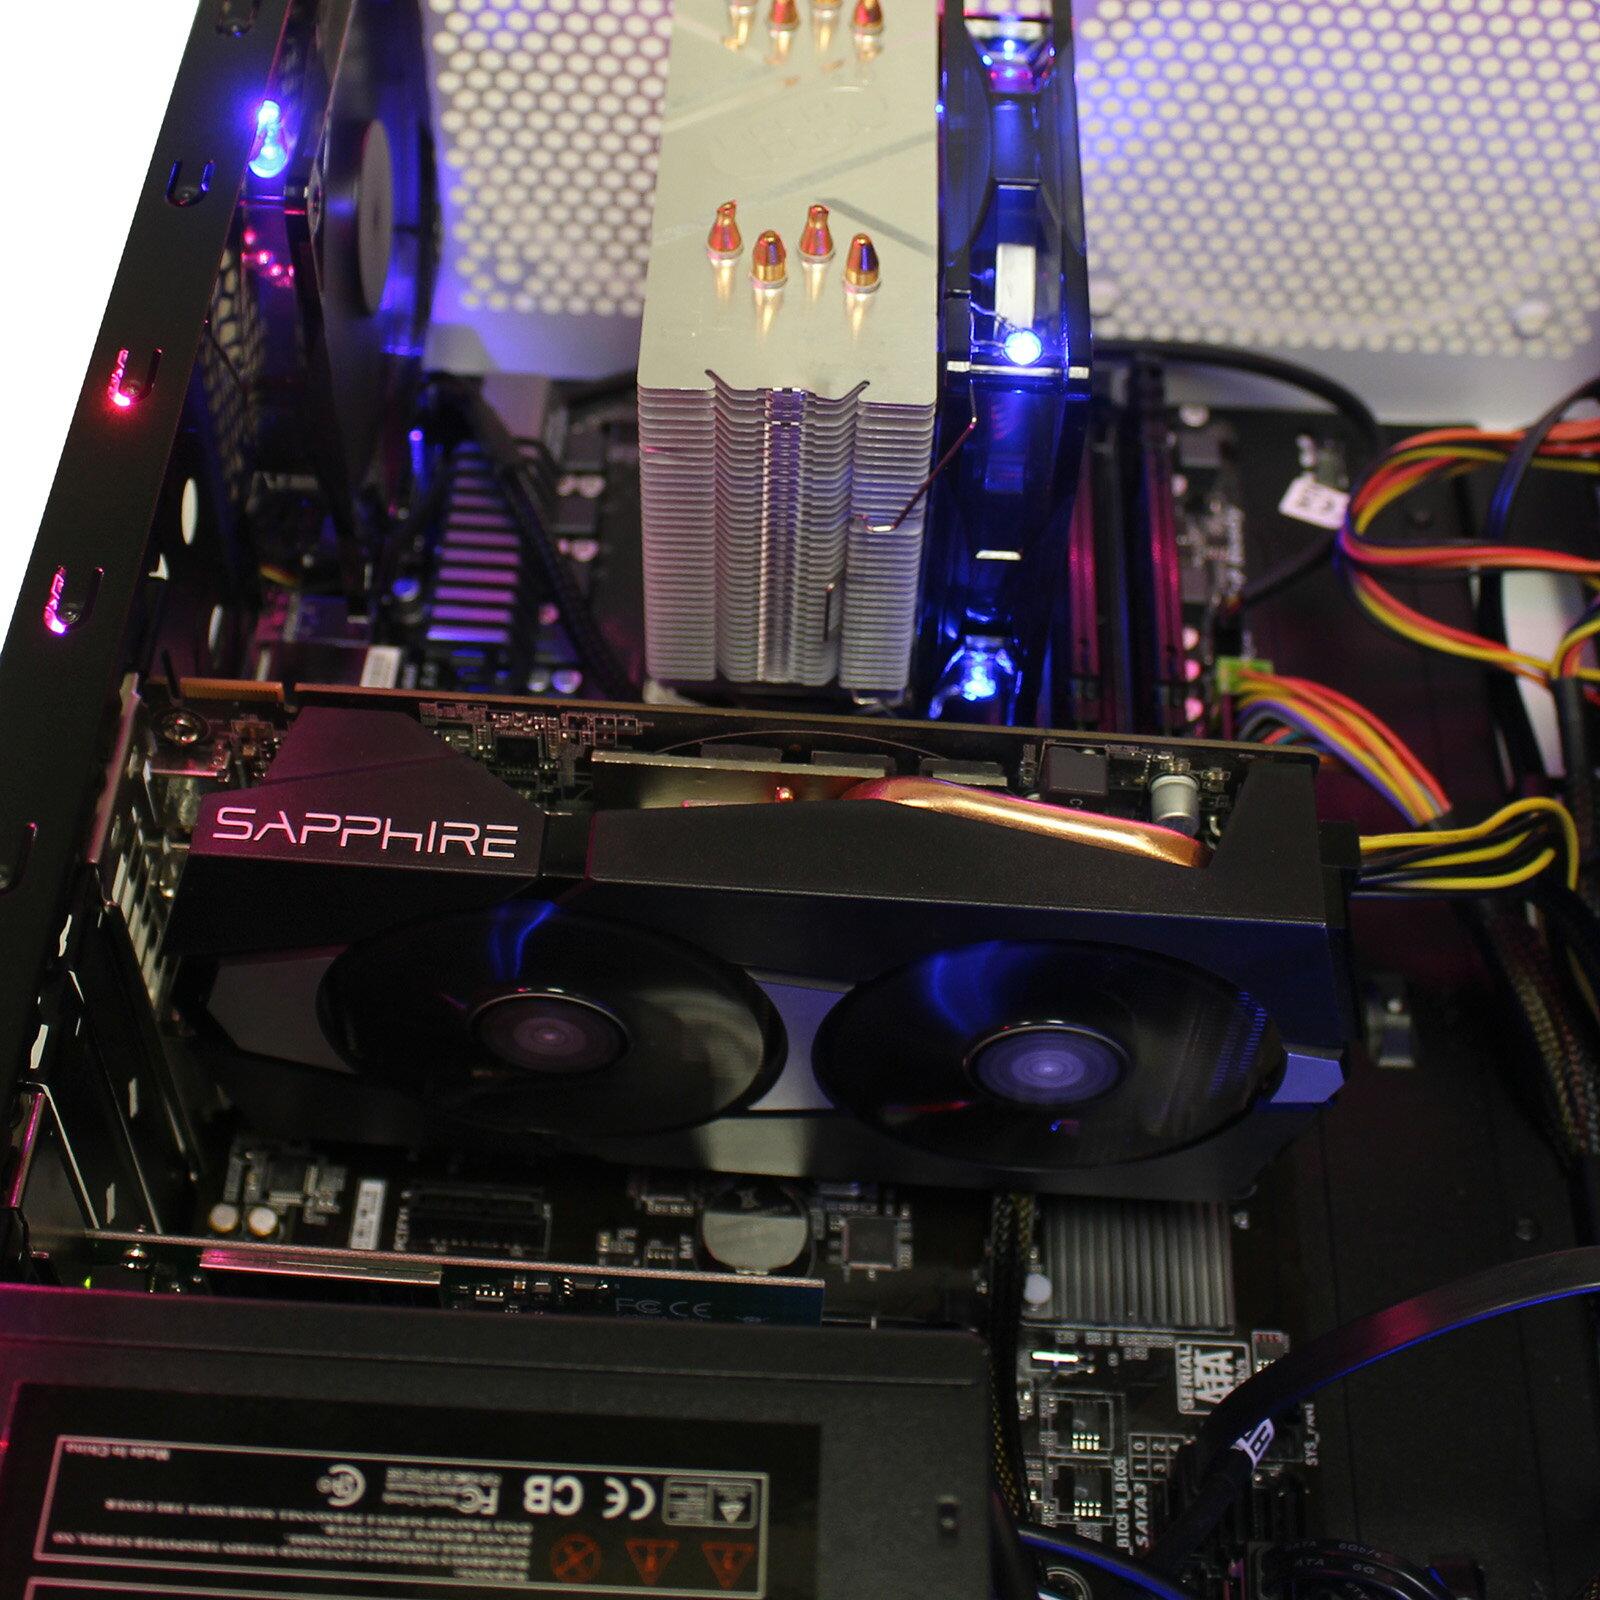 Custom RGB ThermalTake Gaming PC AMD 6-Core 3 5GHz AMD R9 270 2GB GDDR5  HDMI 16GB RAM 256GB SSD 2TB HD DVDRW WiFi Windows 10 Pro